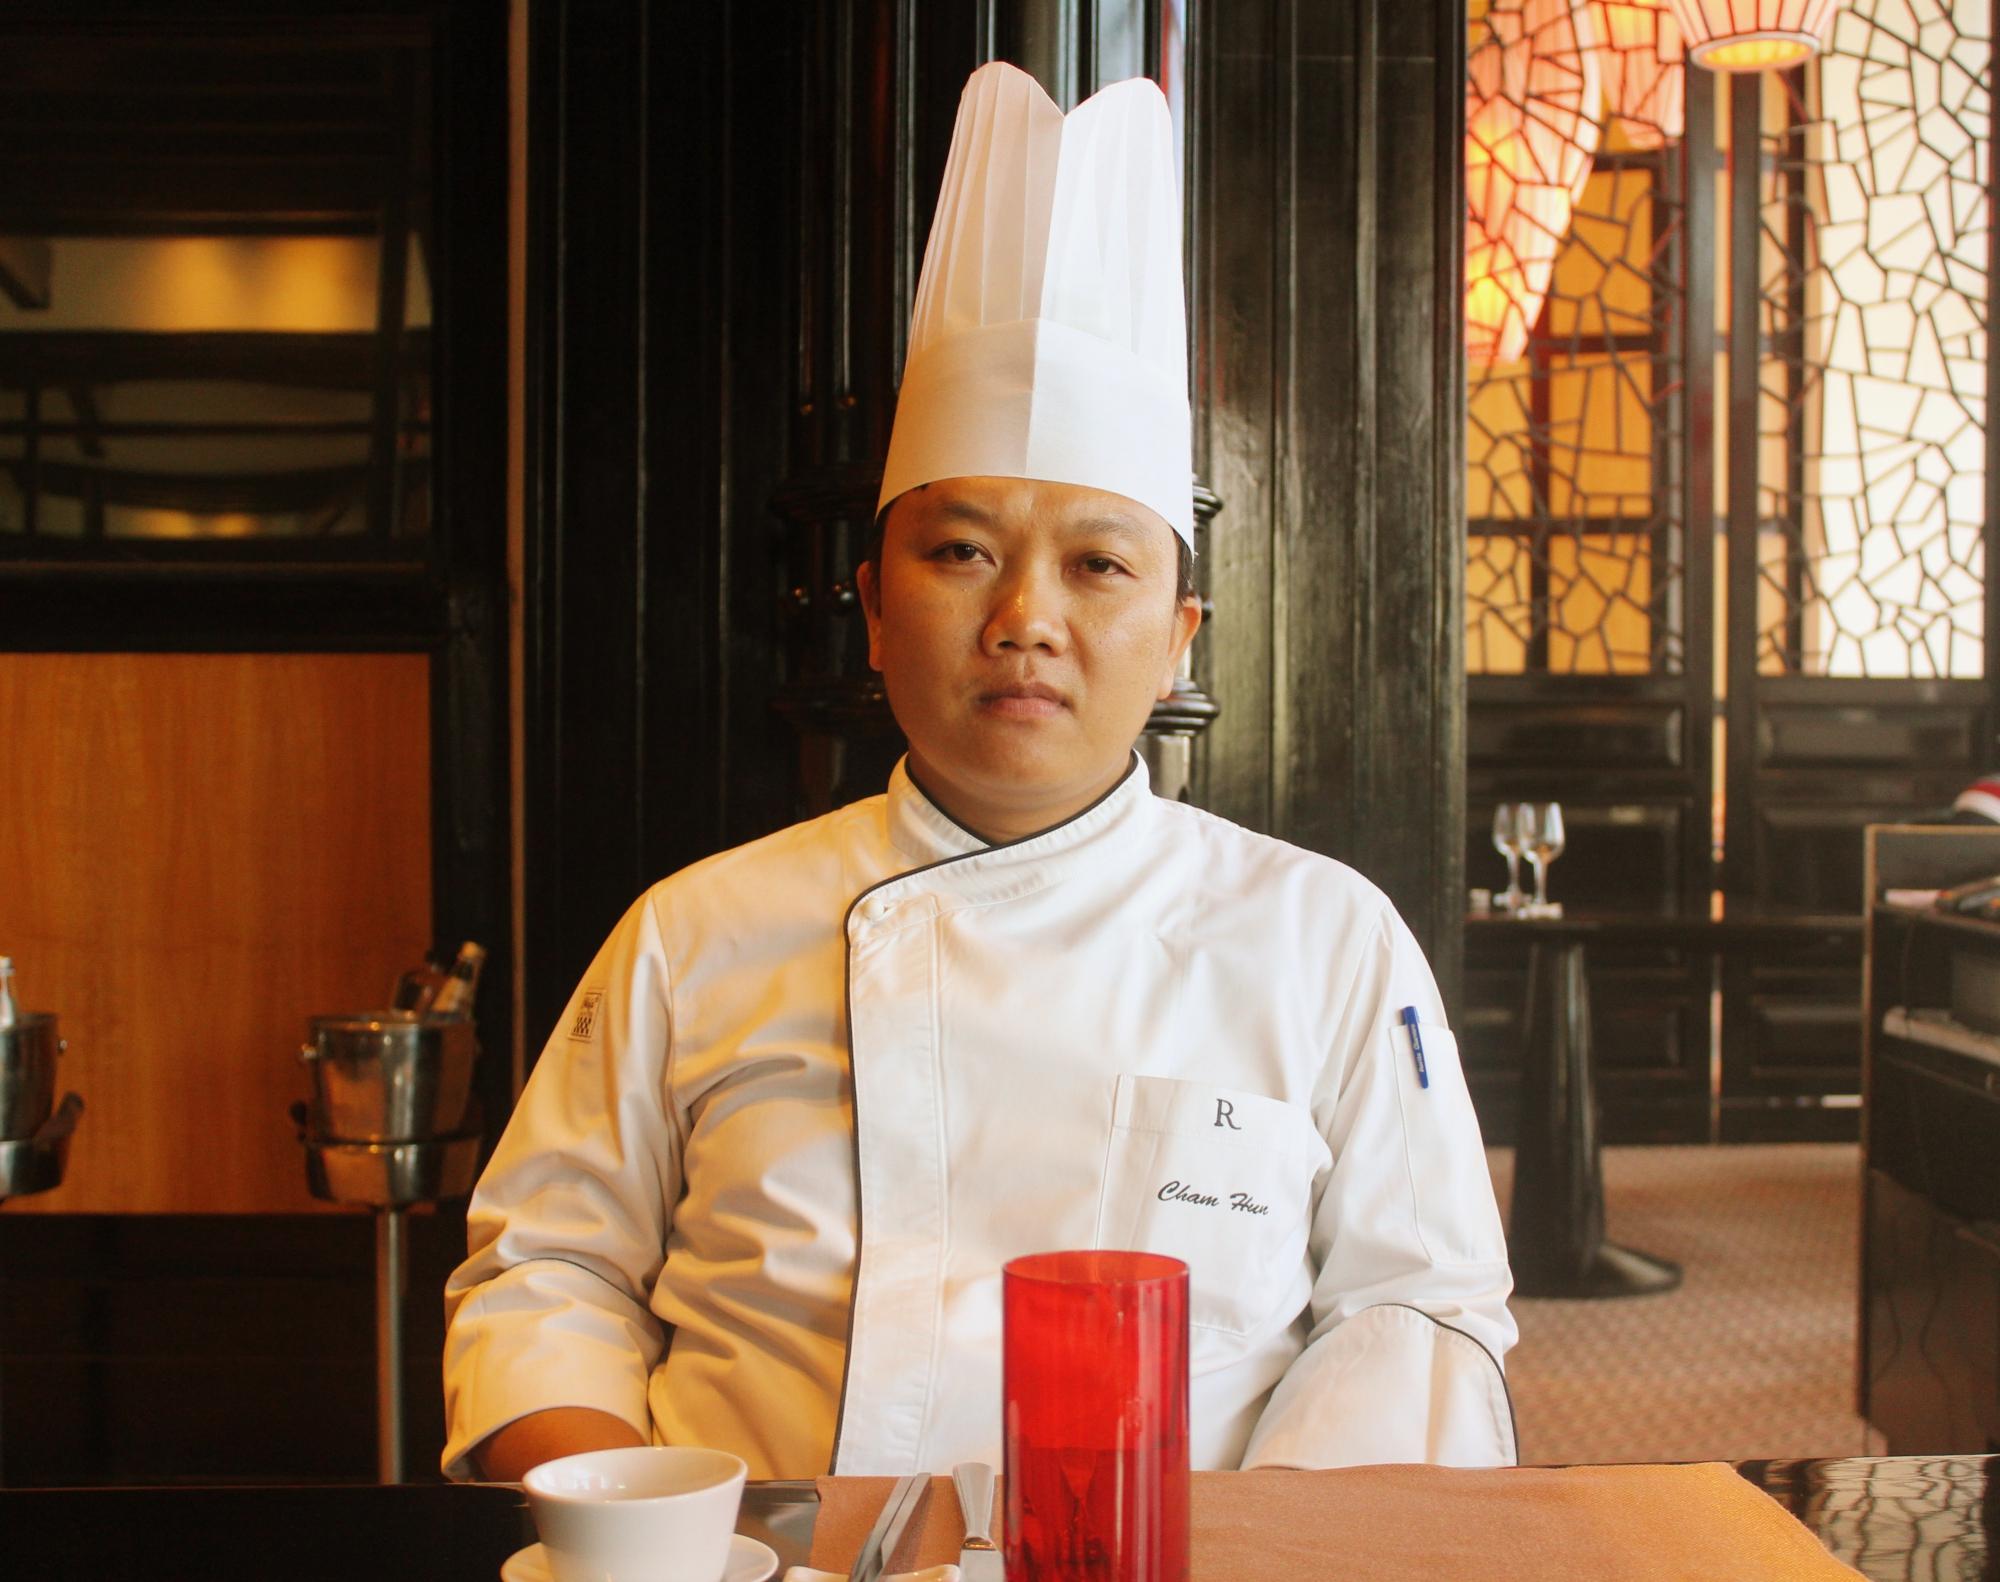 Chef Cham Hun